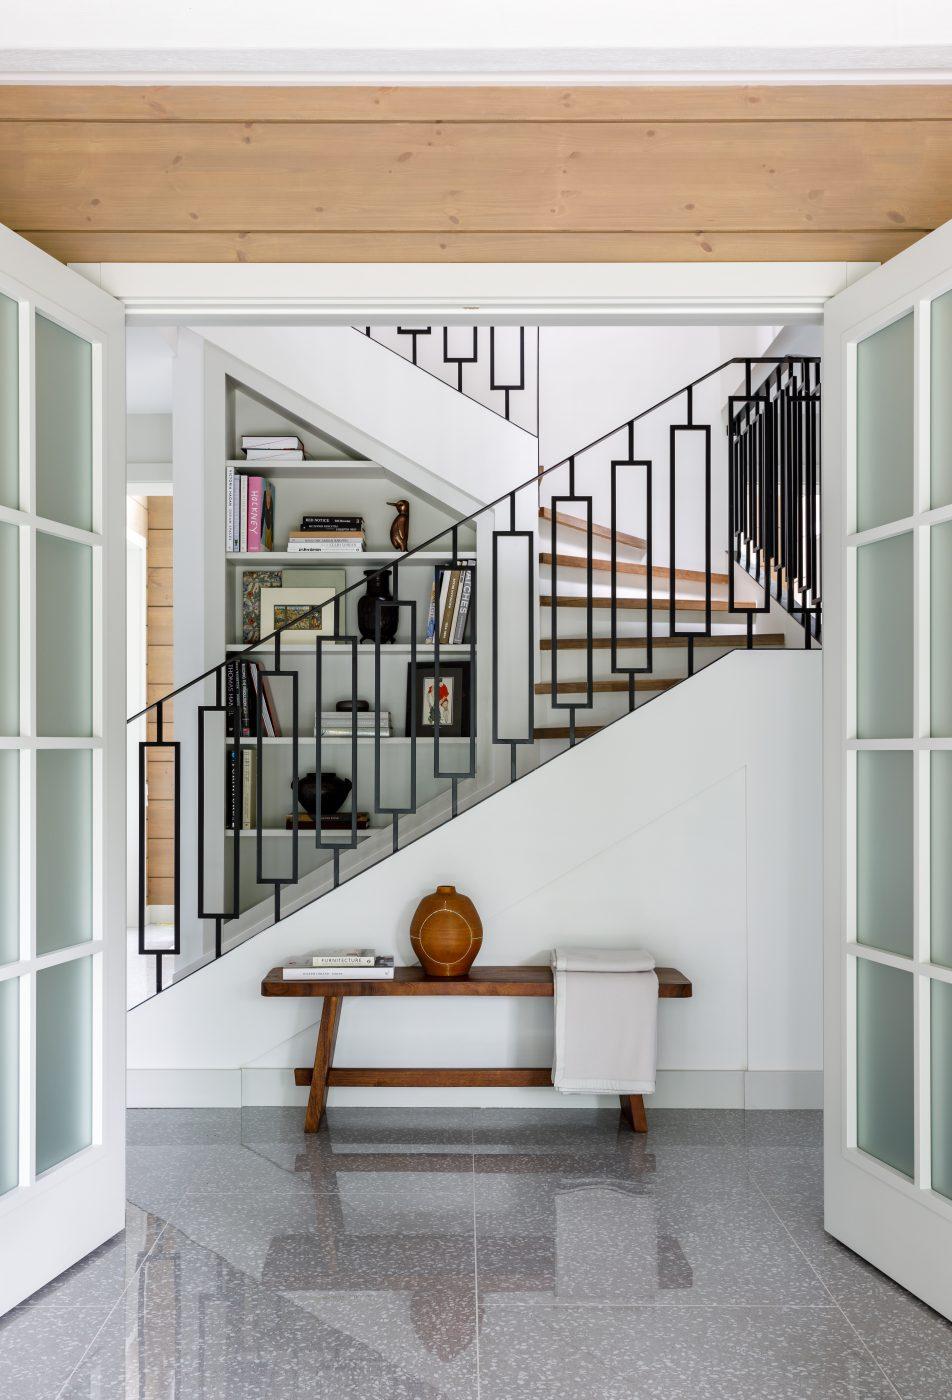 Stair hall designed by Olga Malyeva